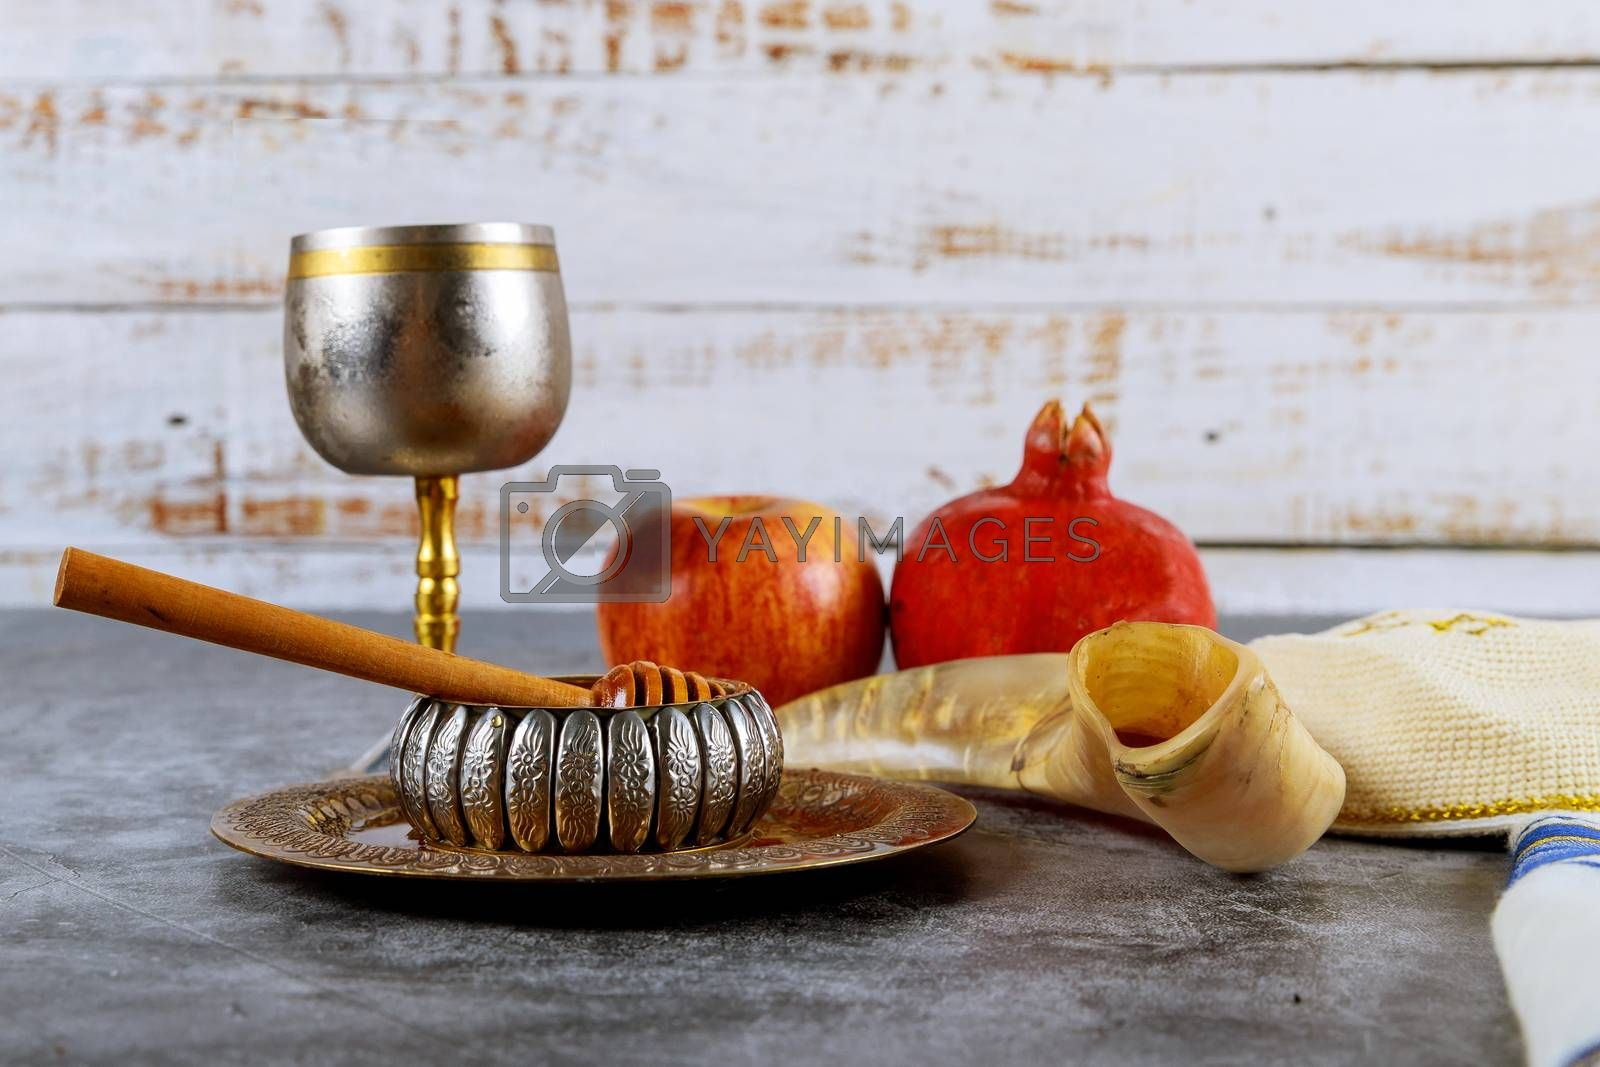 Jewish new year symbol Rosh hashanah with glass honey jar and fresh ripe apples.